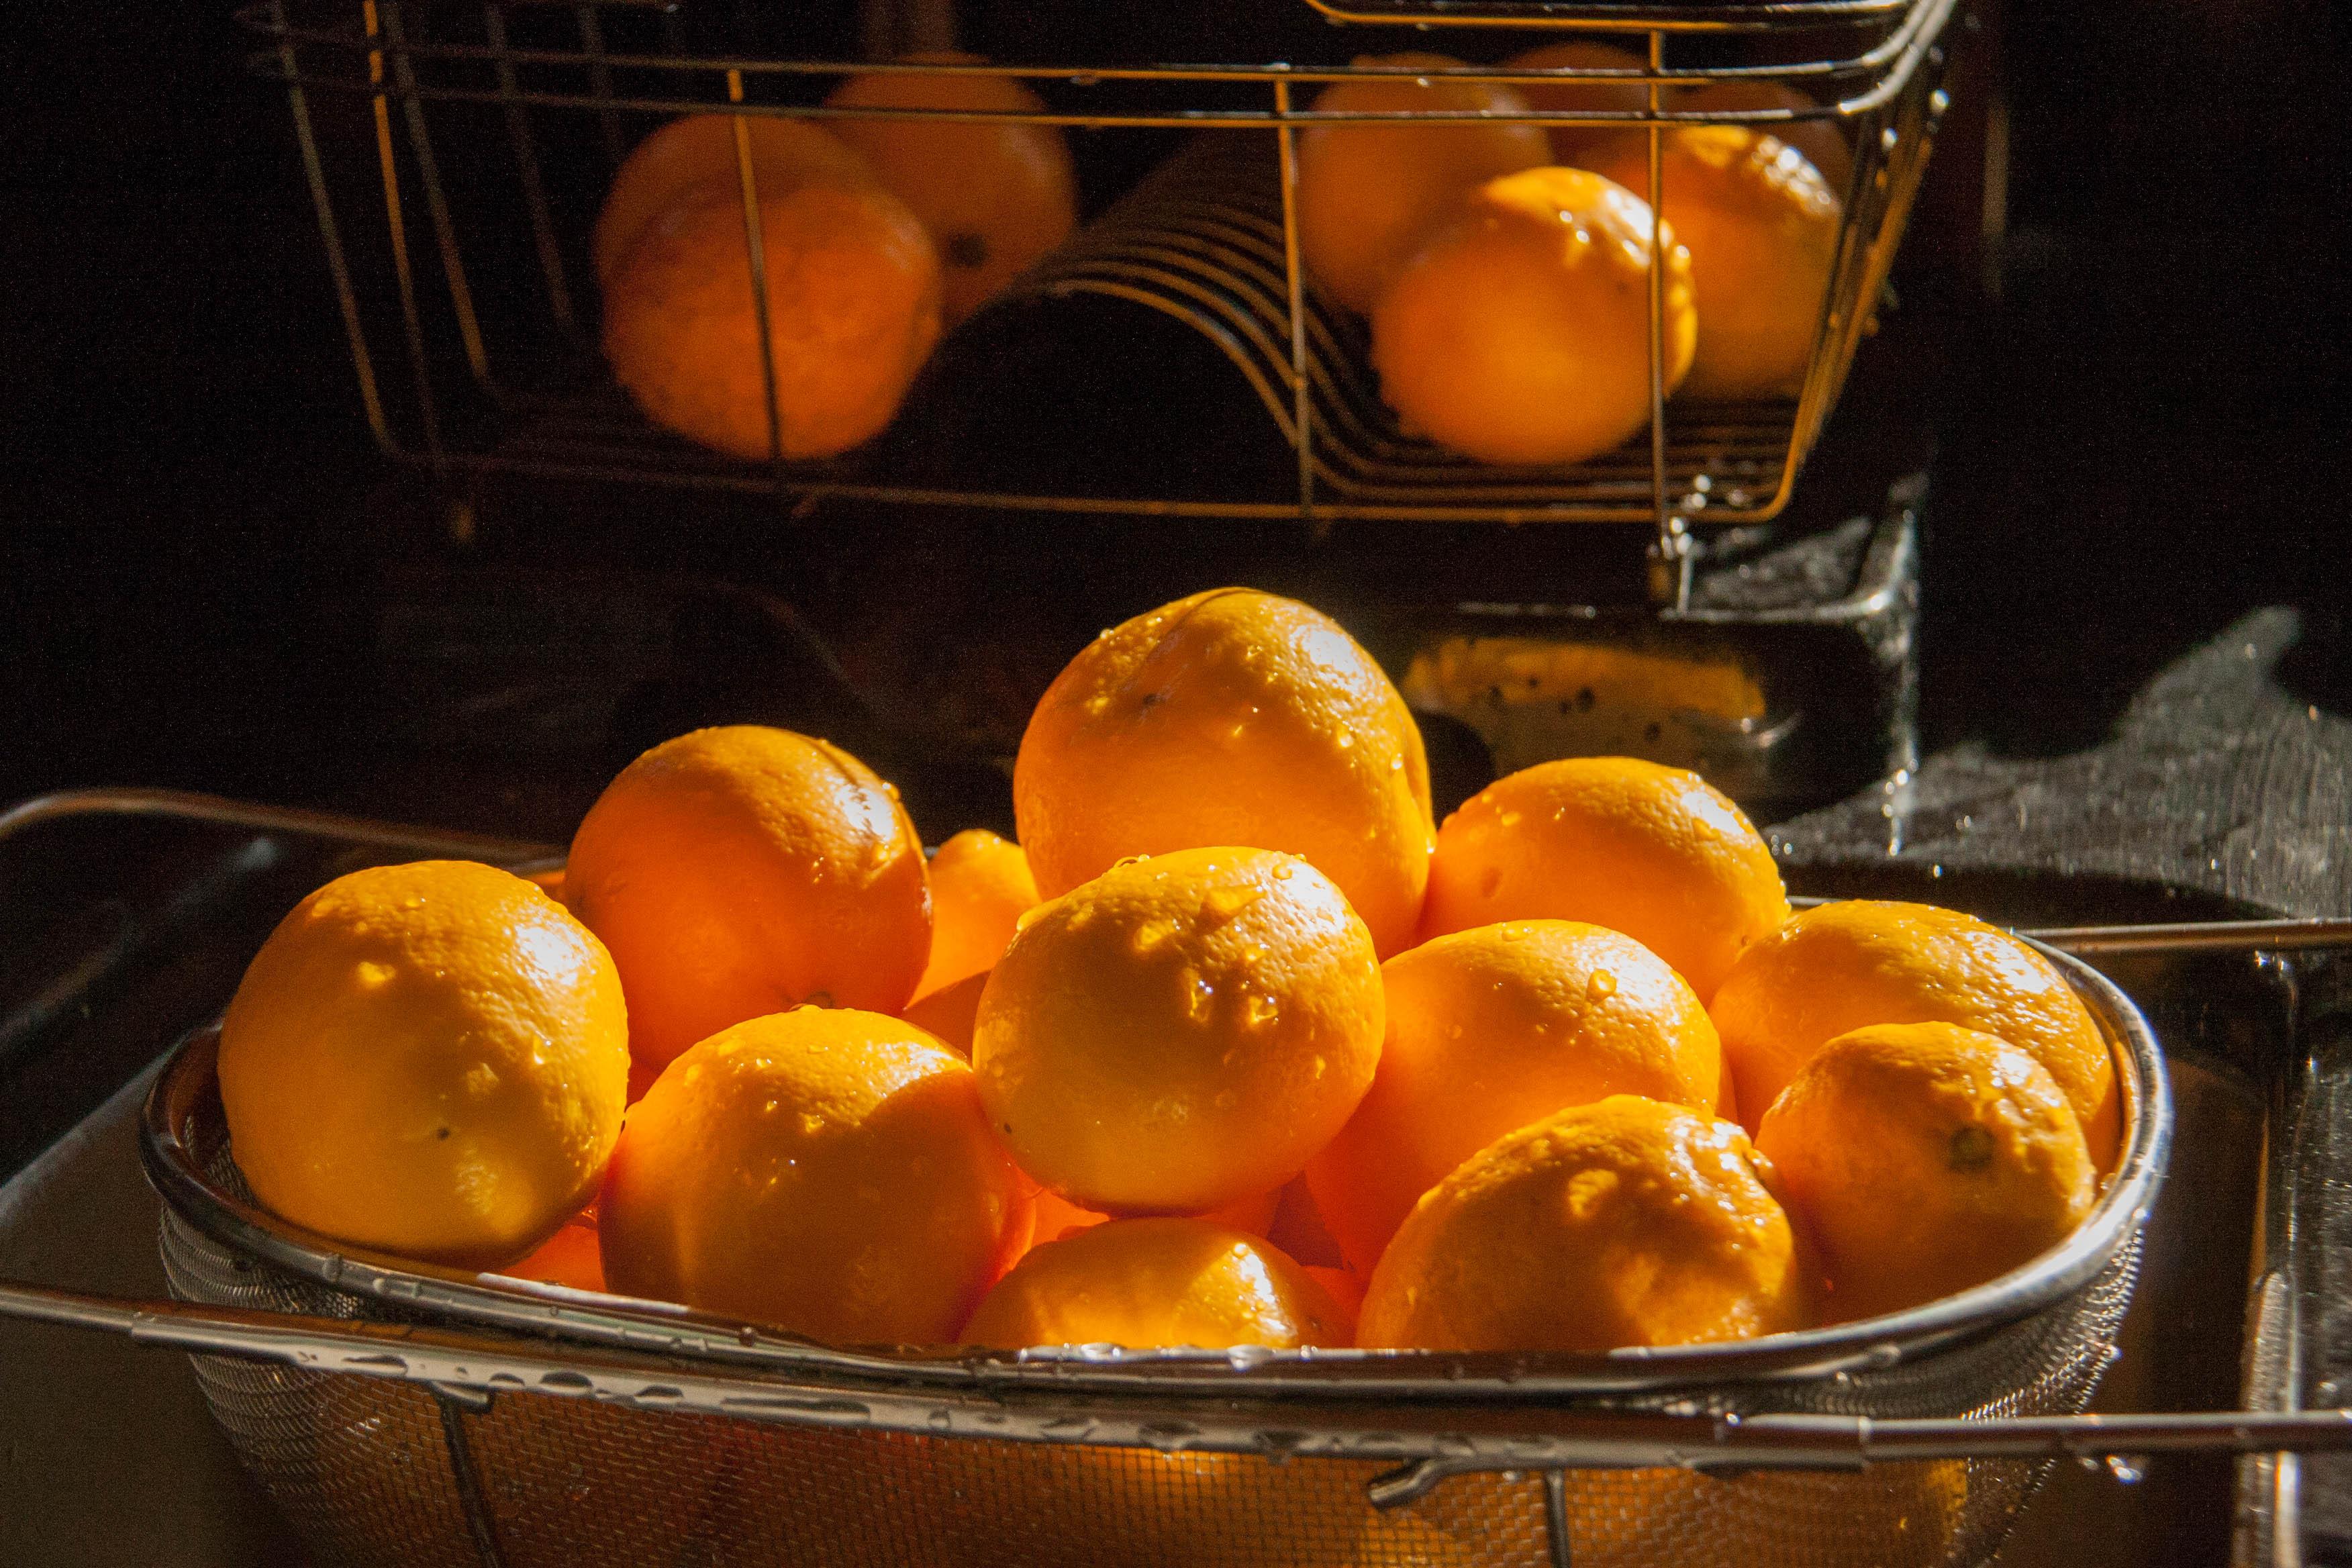 Improved Meyer Lemon (Citrus x Meyeri 'Improved')